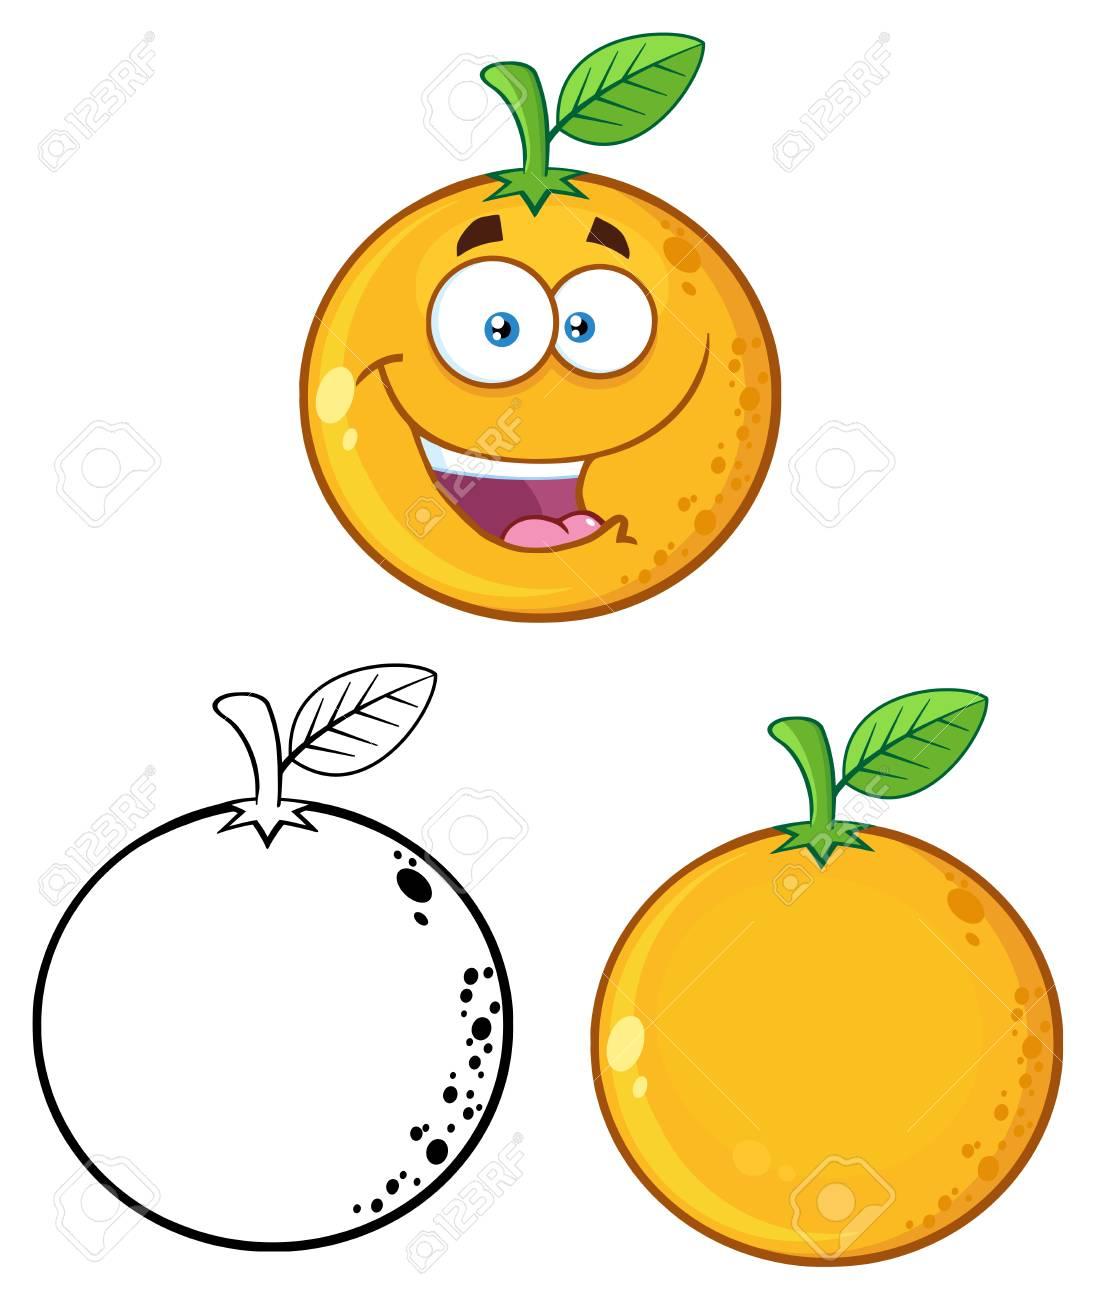 1096x1300 Orange Fresh Fruit With Green Leaf Cartoon Drawing 3. Set